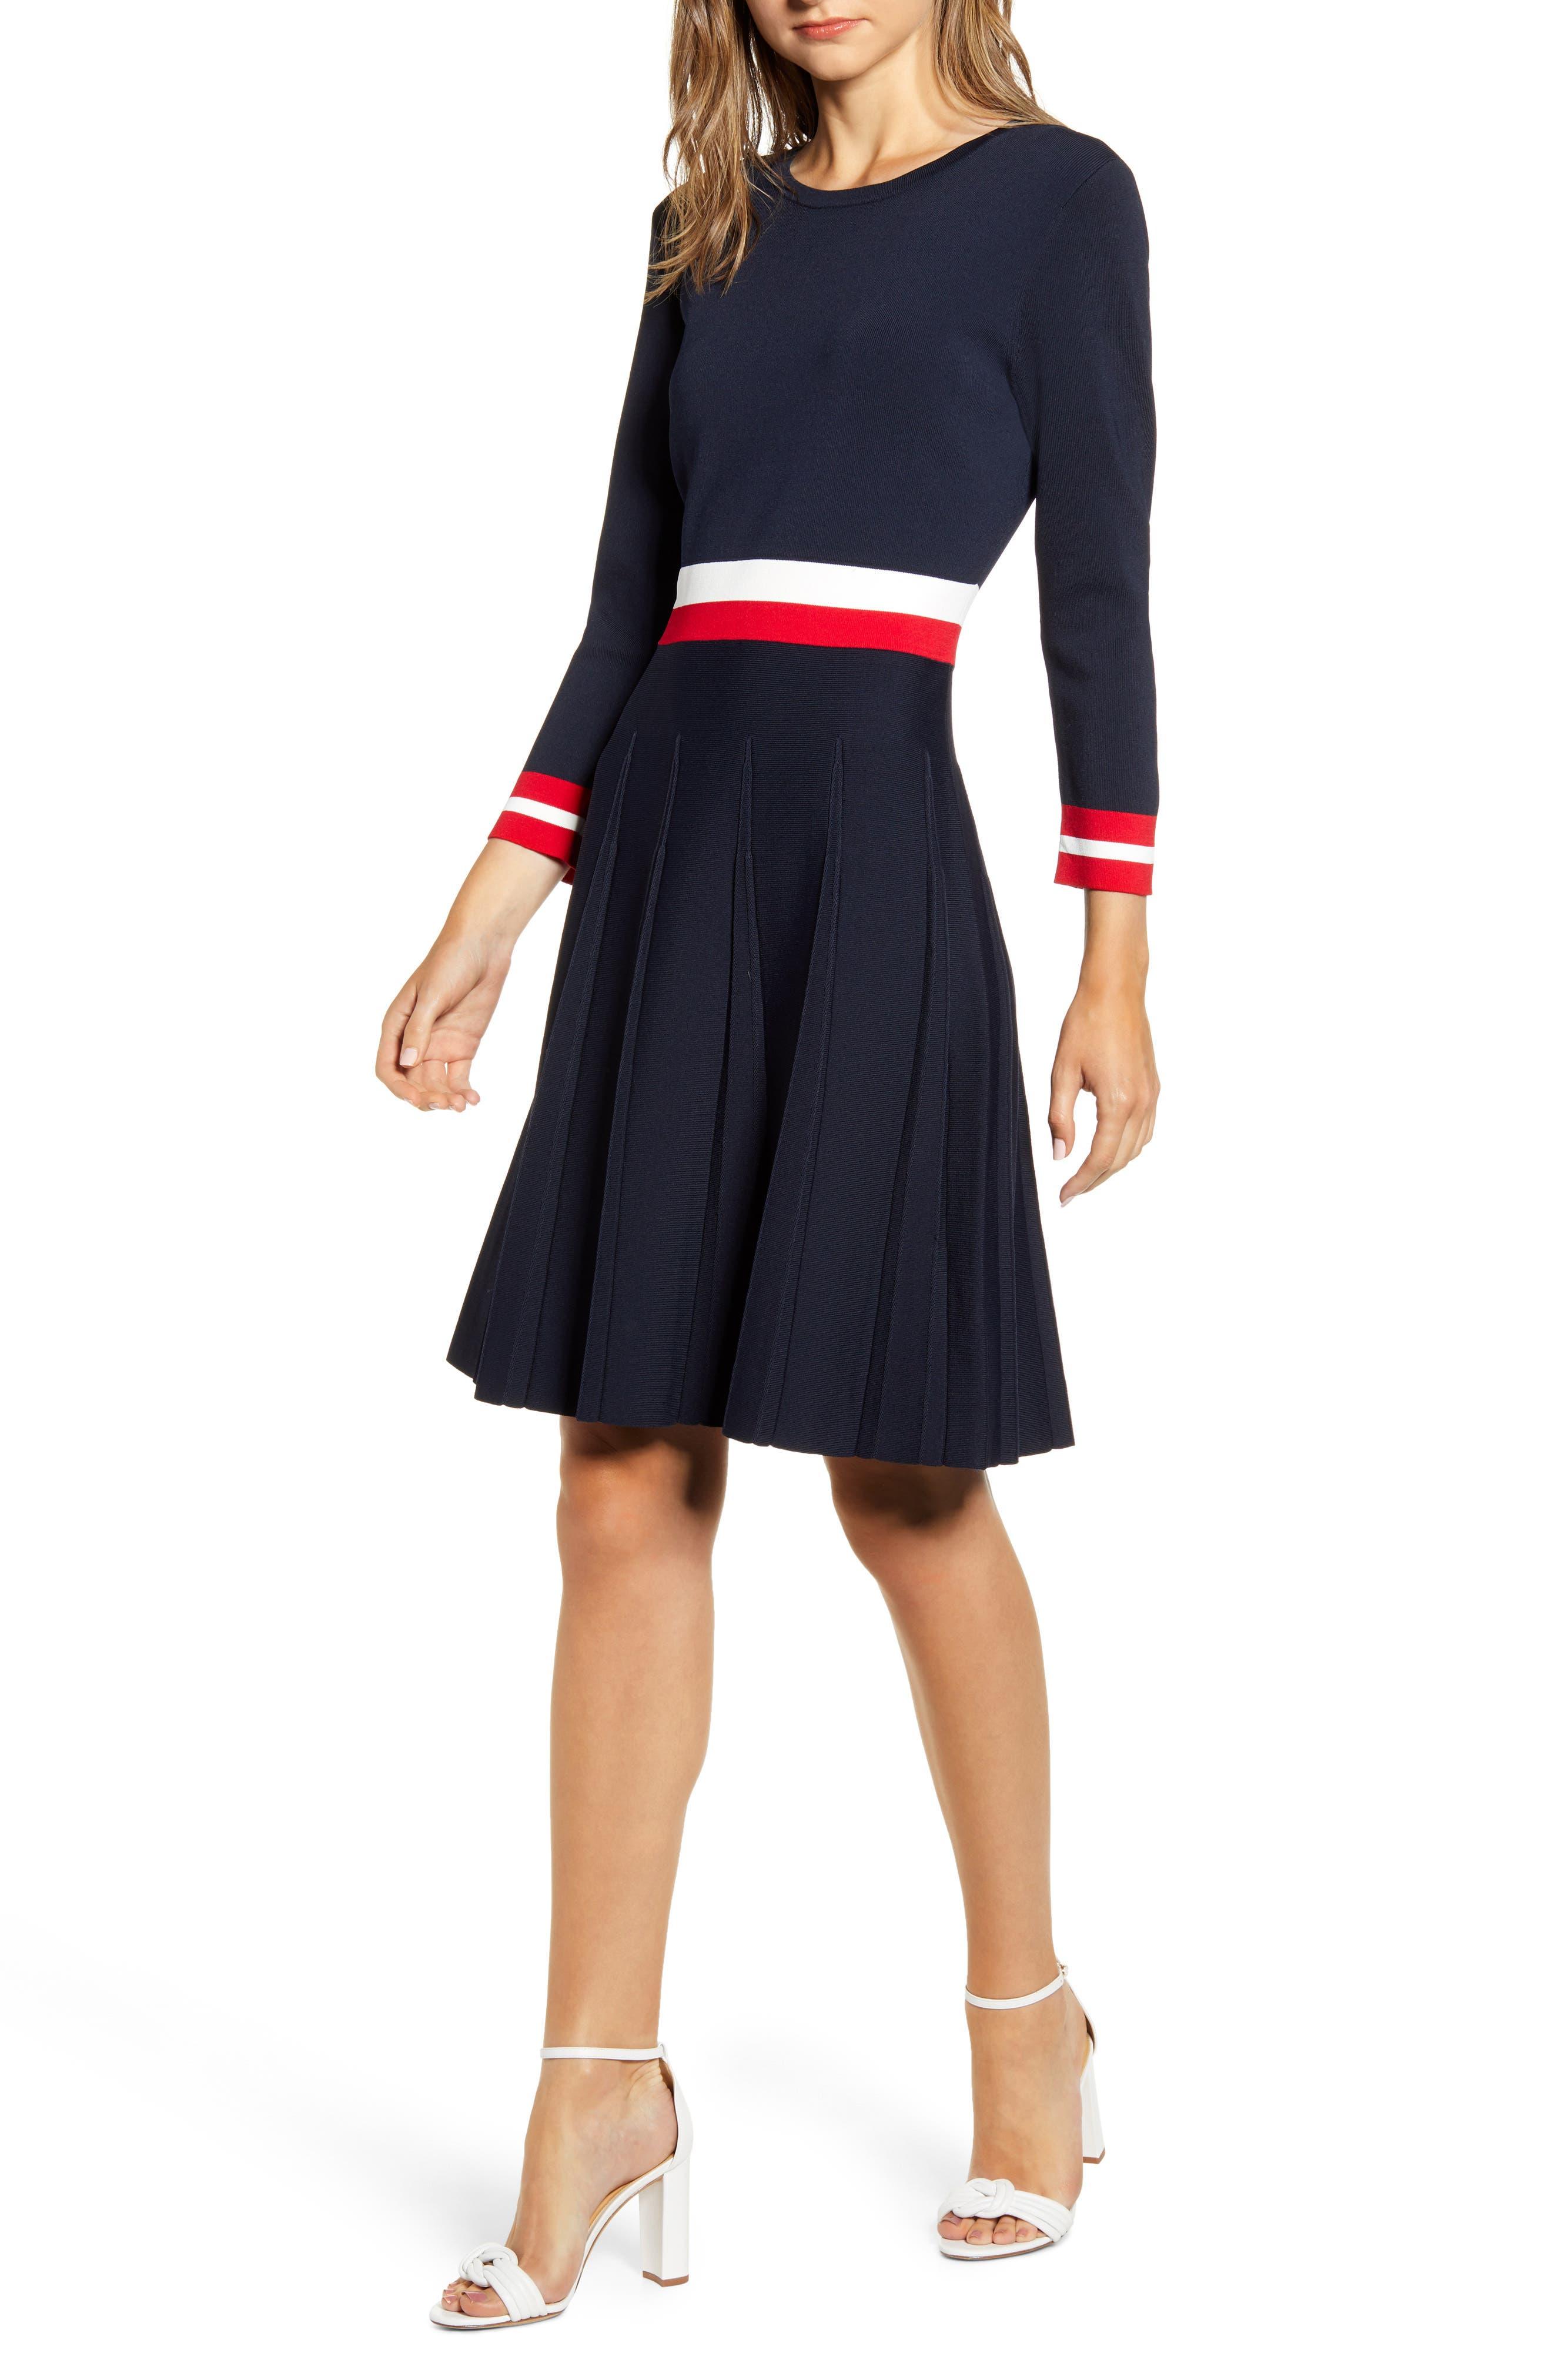 Tommy Hilfiger Dresses Fit & Flare Sweater Dress